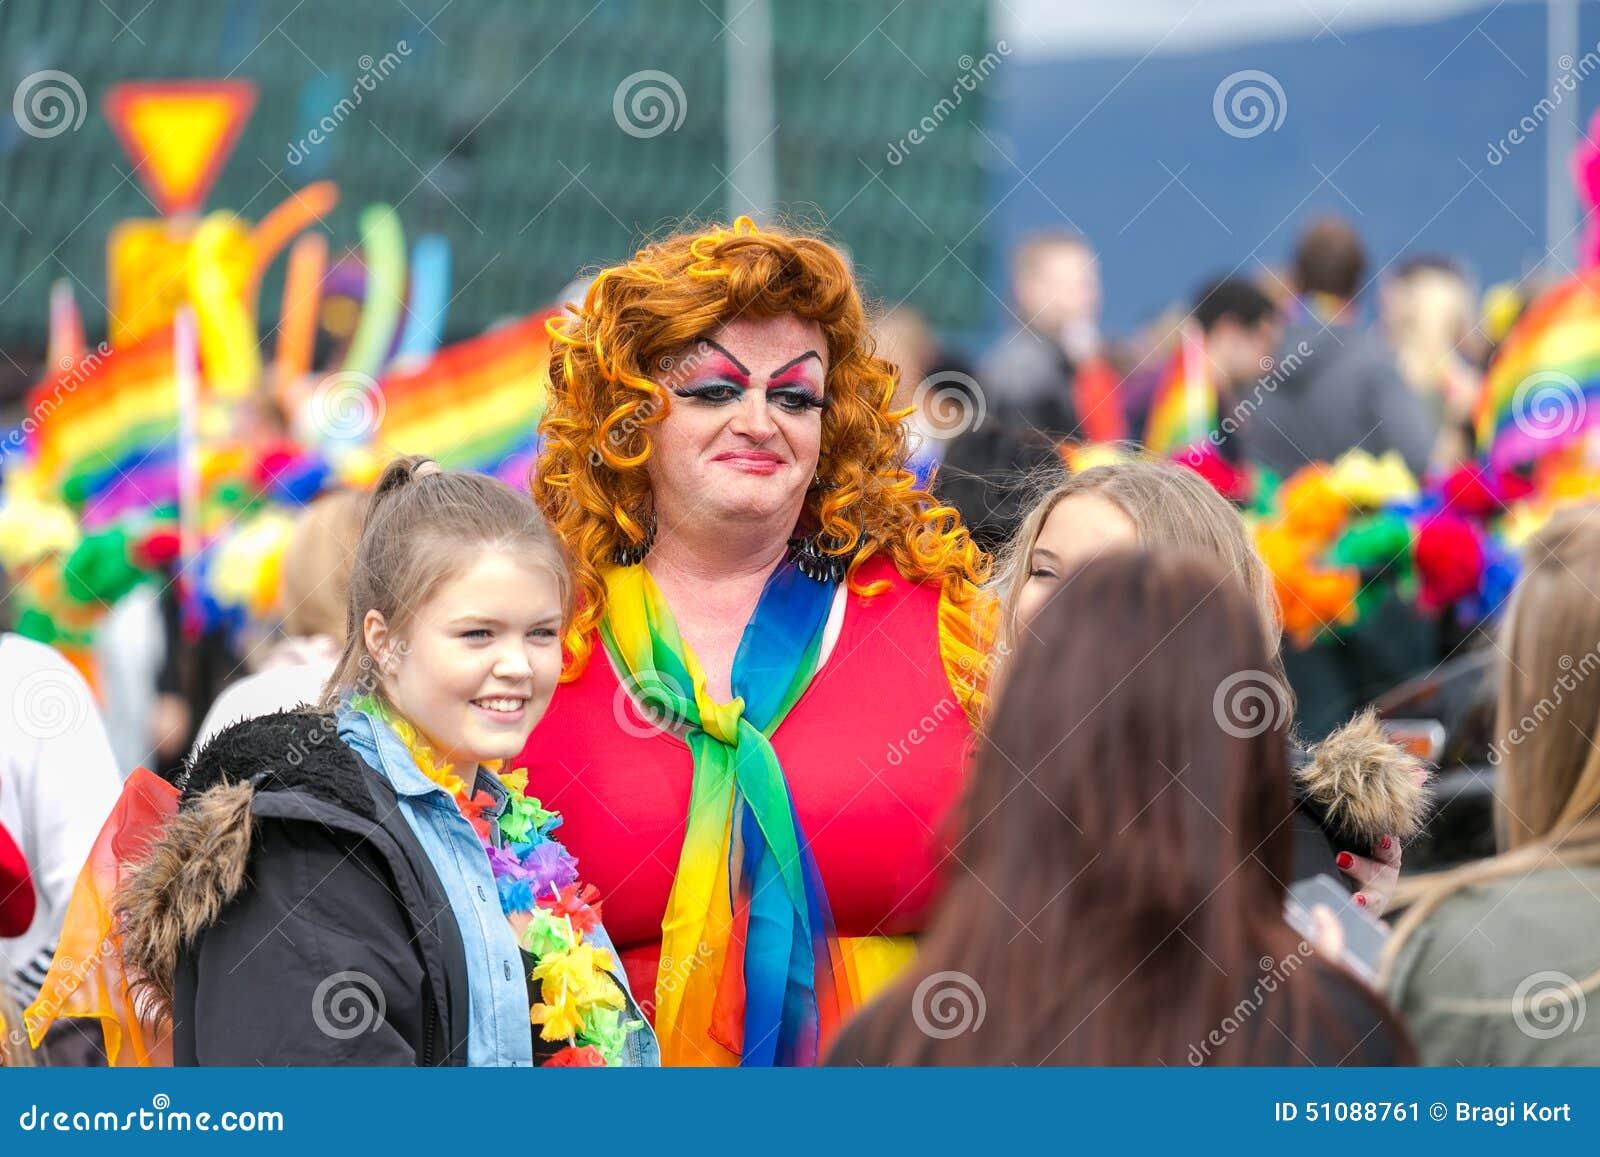 gay ceremony locations